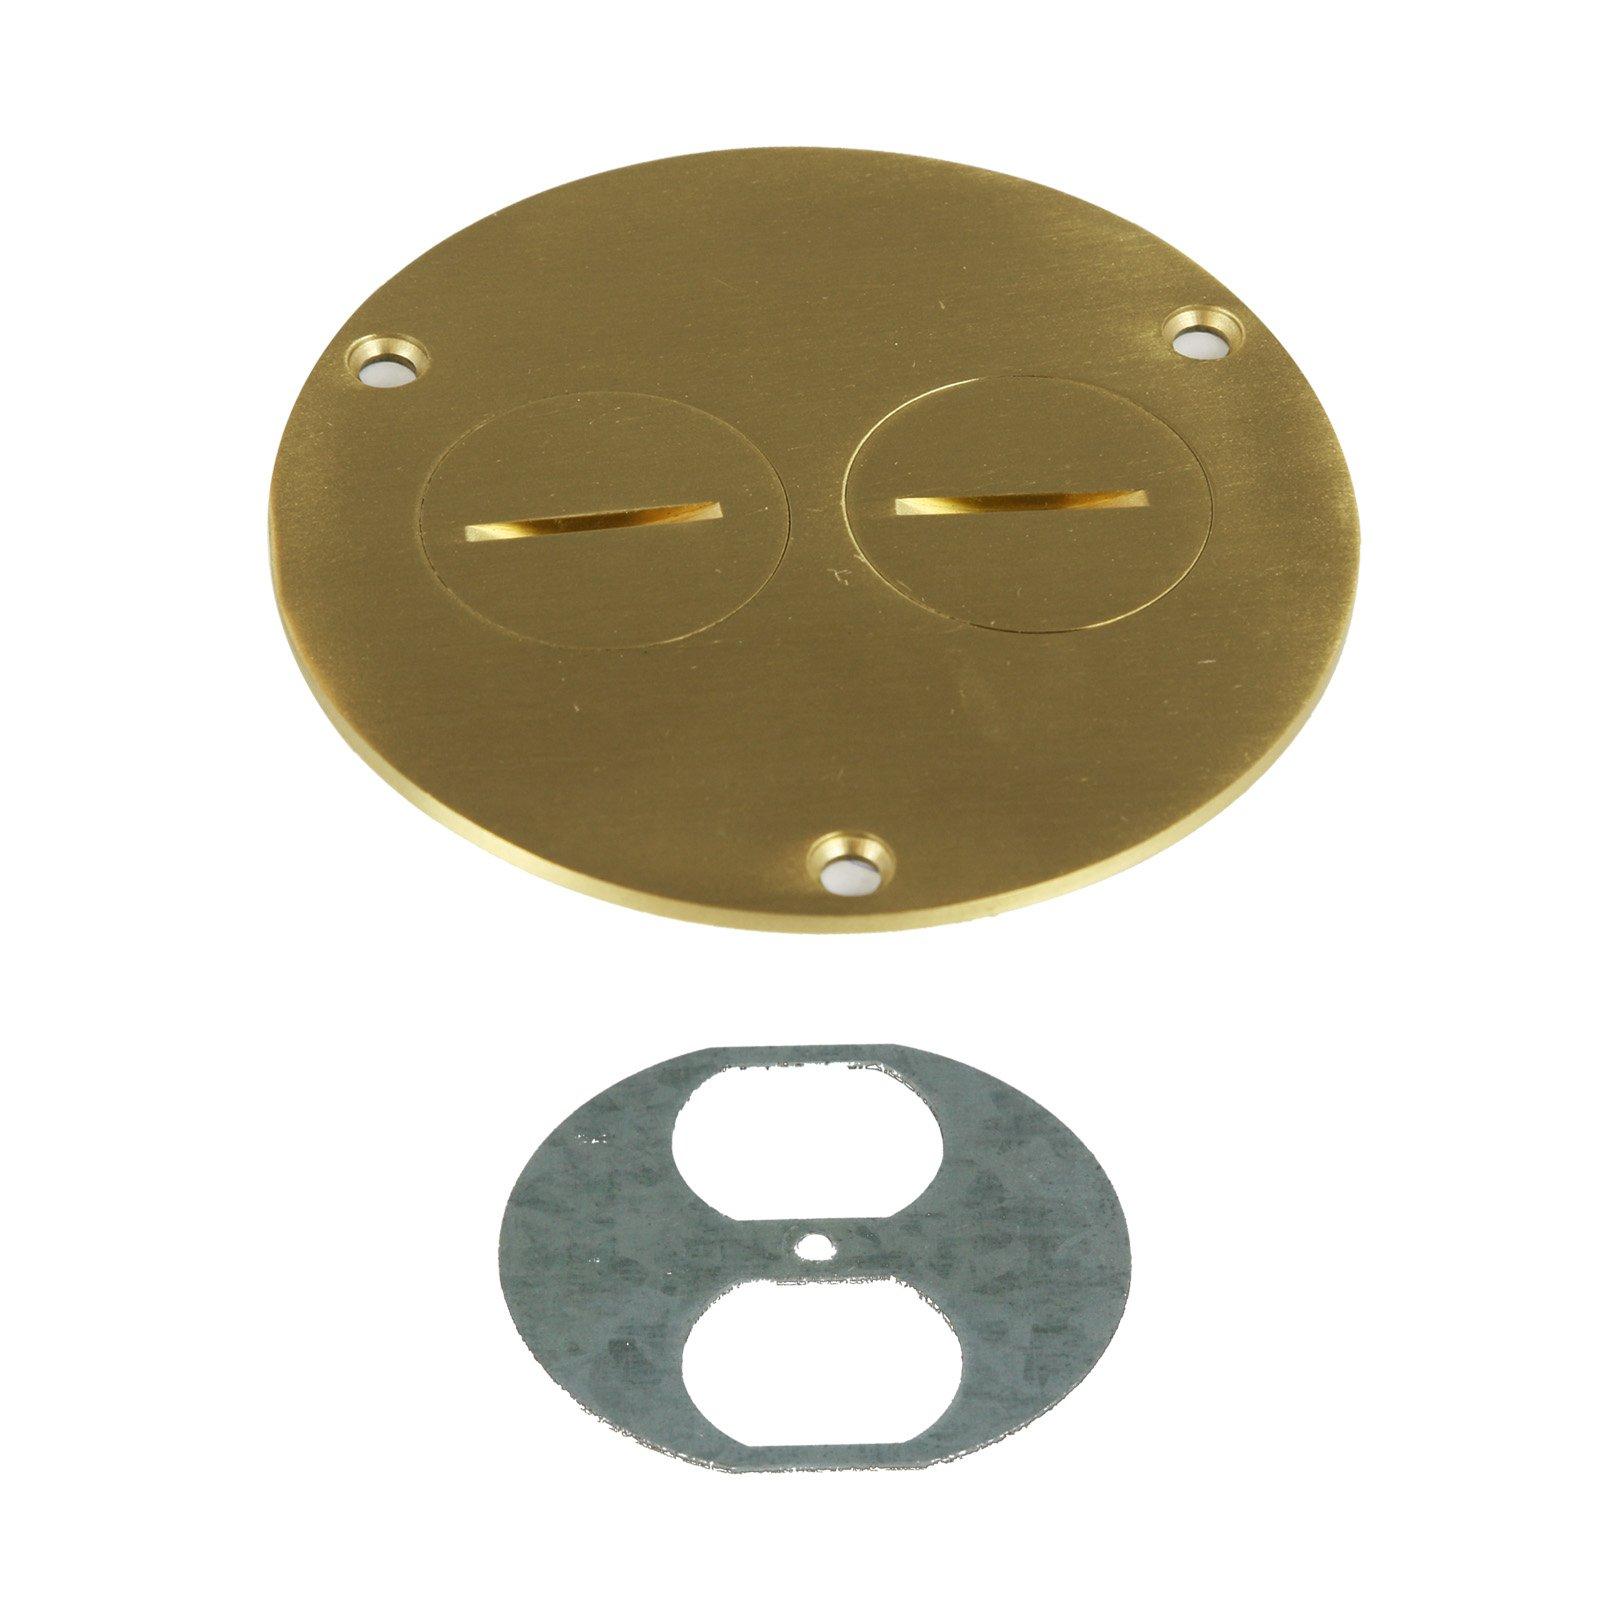 ENERLITES Screw Cap Floor Box Cover, 4'' Diameter, 20A Tamper-Weather Resistant Receptacle Outlet, Watertight Gaskets, 975501-C, UL Listed, Brass by ENERLITES (Image #1)